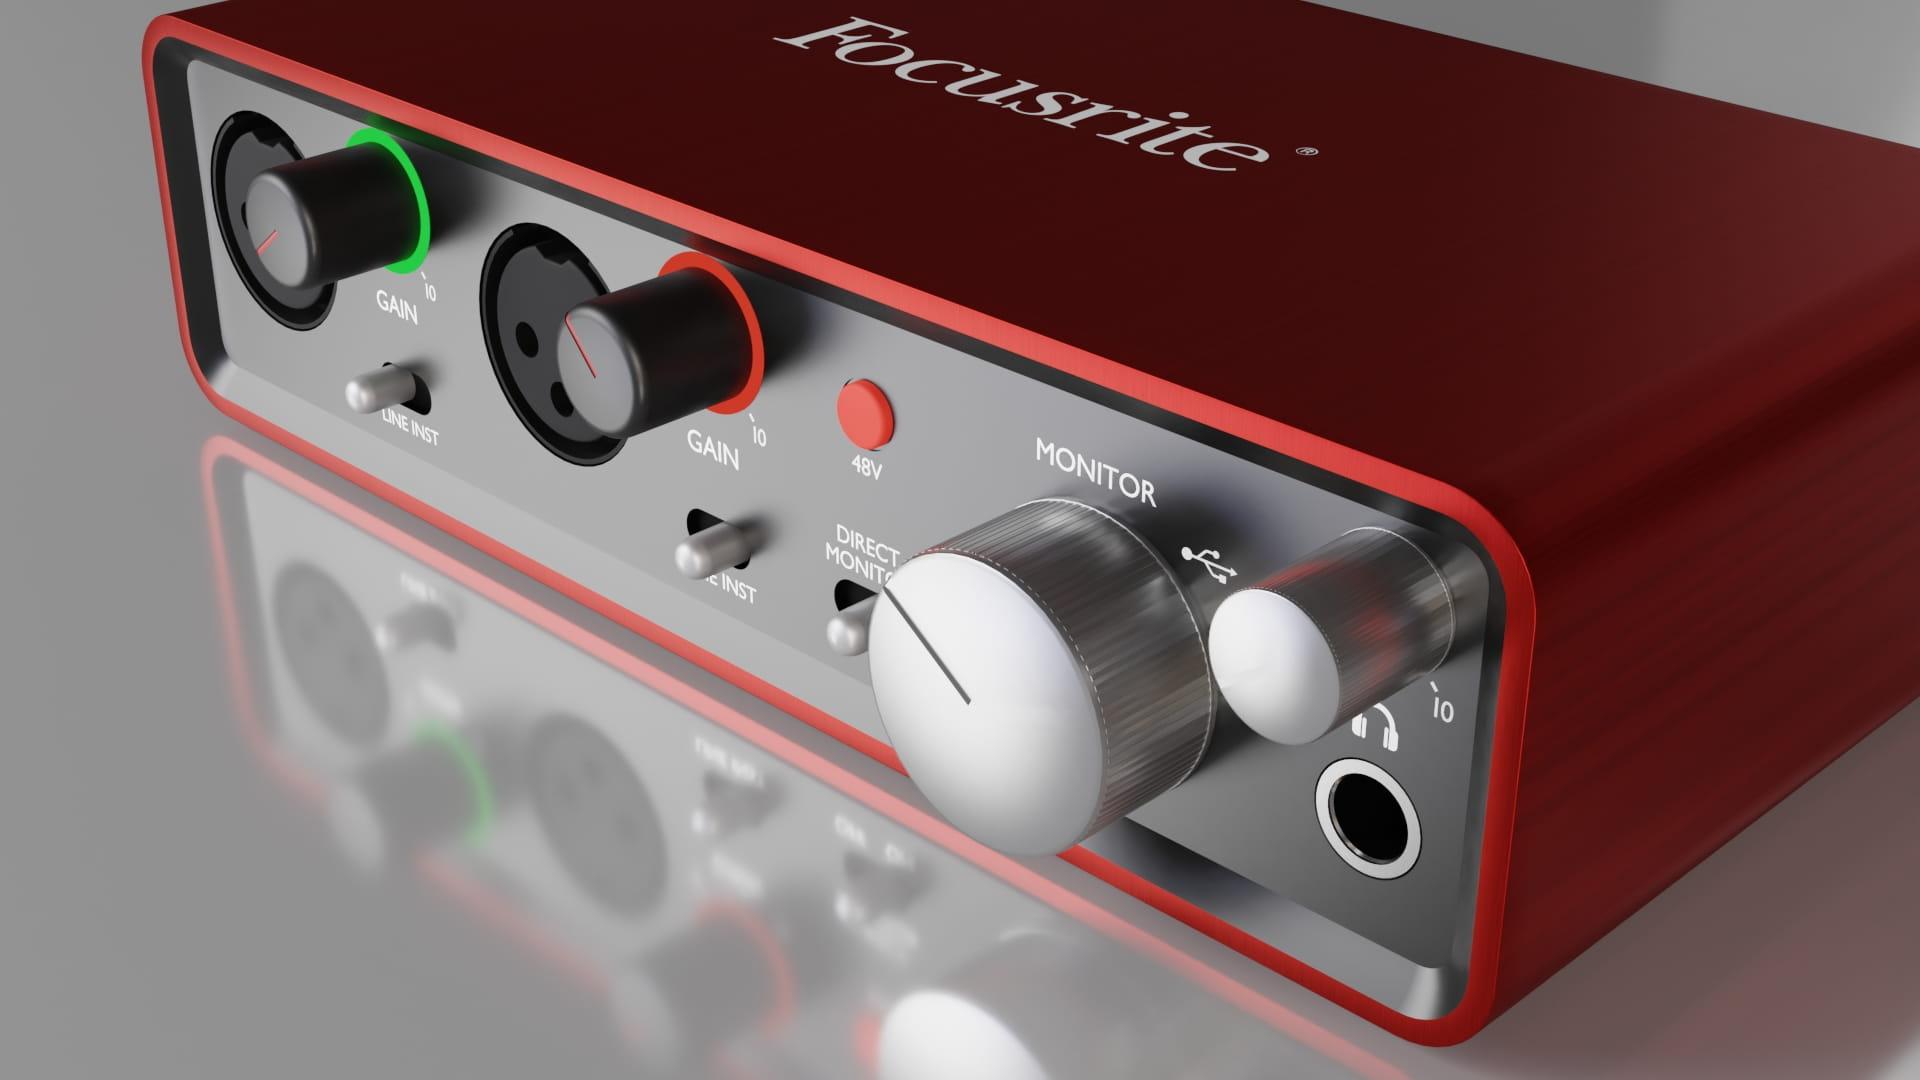 Model 3d Focusrite Scarlett 2i2 zaprojektowany w Blender 2.8 - Widok izometryczny